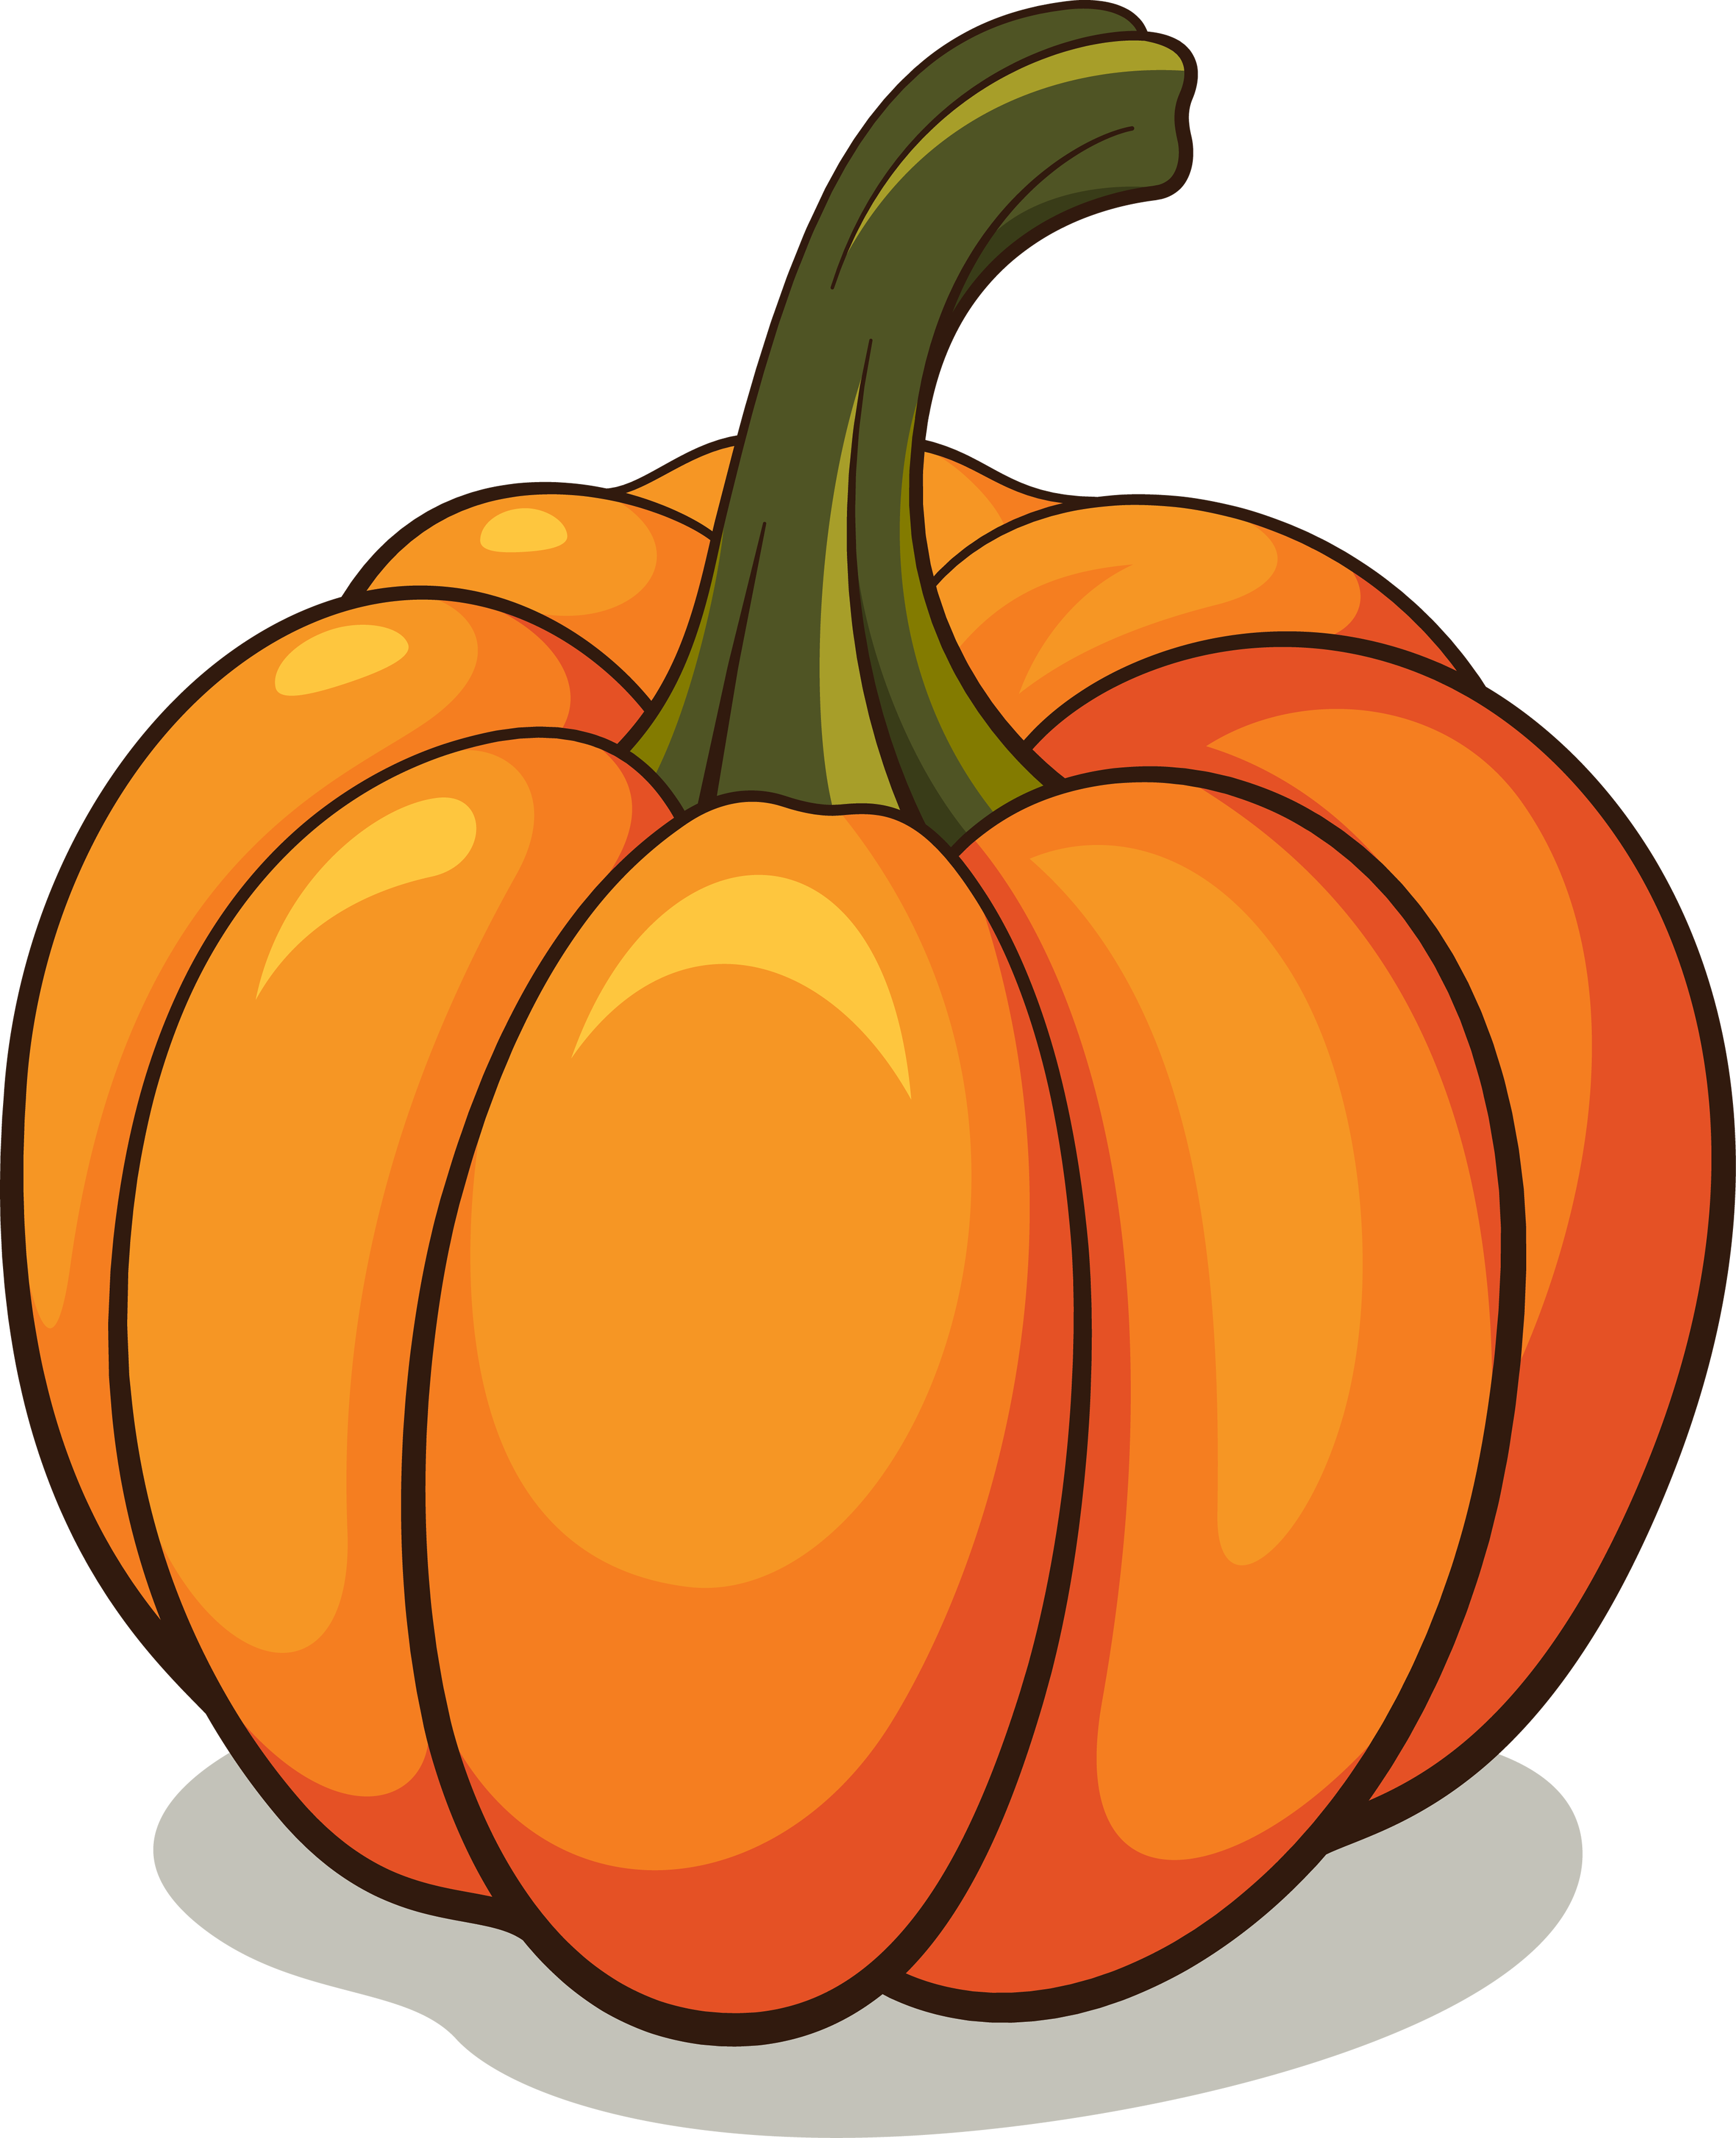 Pumpkin,Calabaza,Orange,Natural foods,Clip art,Vegetable.